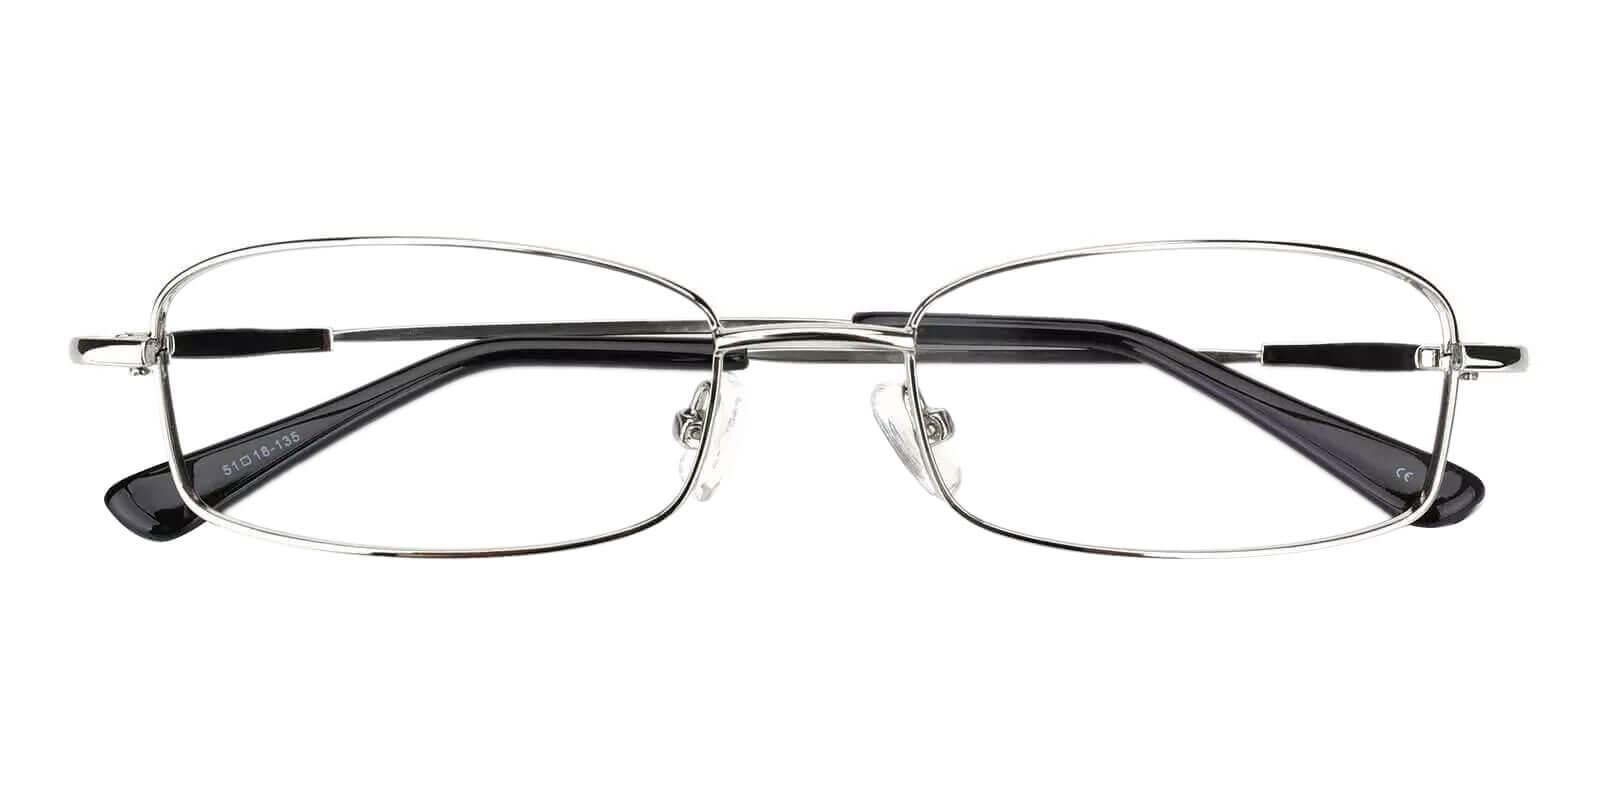 Healdton Silver Metal Eyeglasses , NosePads Frames from ABBE Glasses